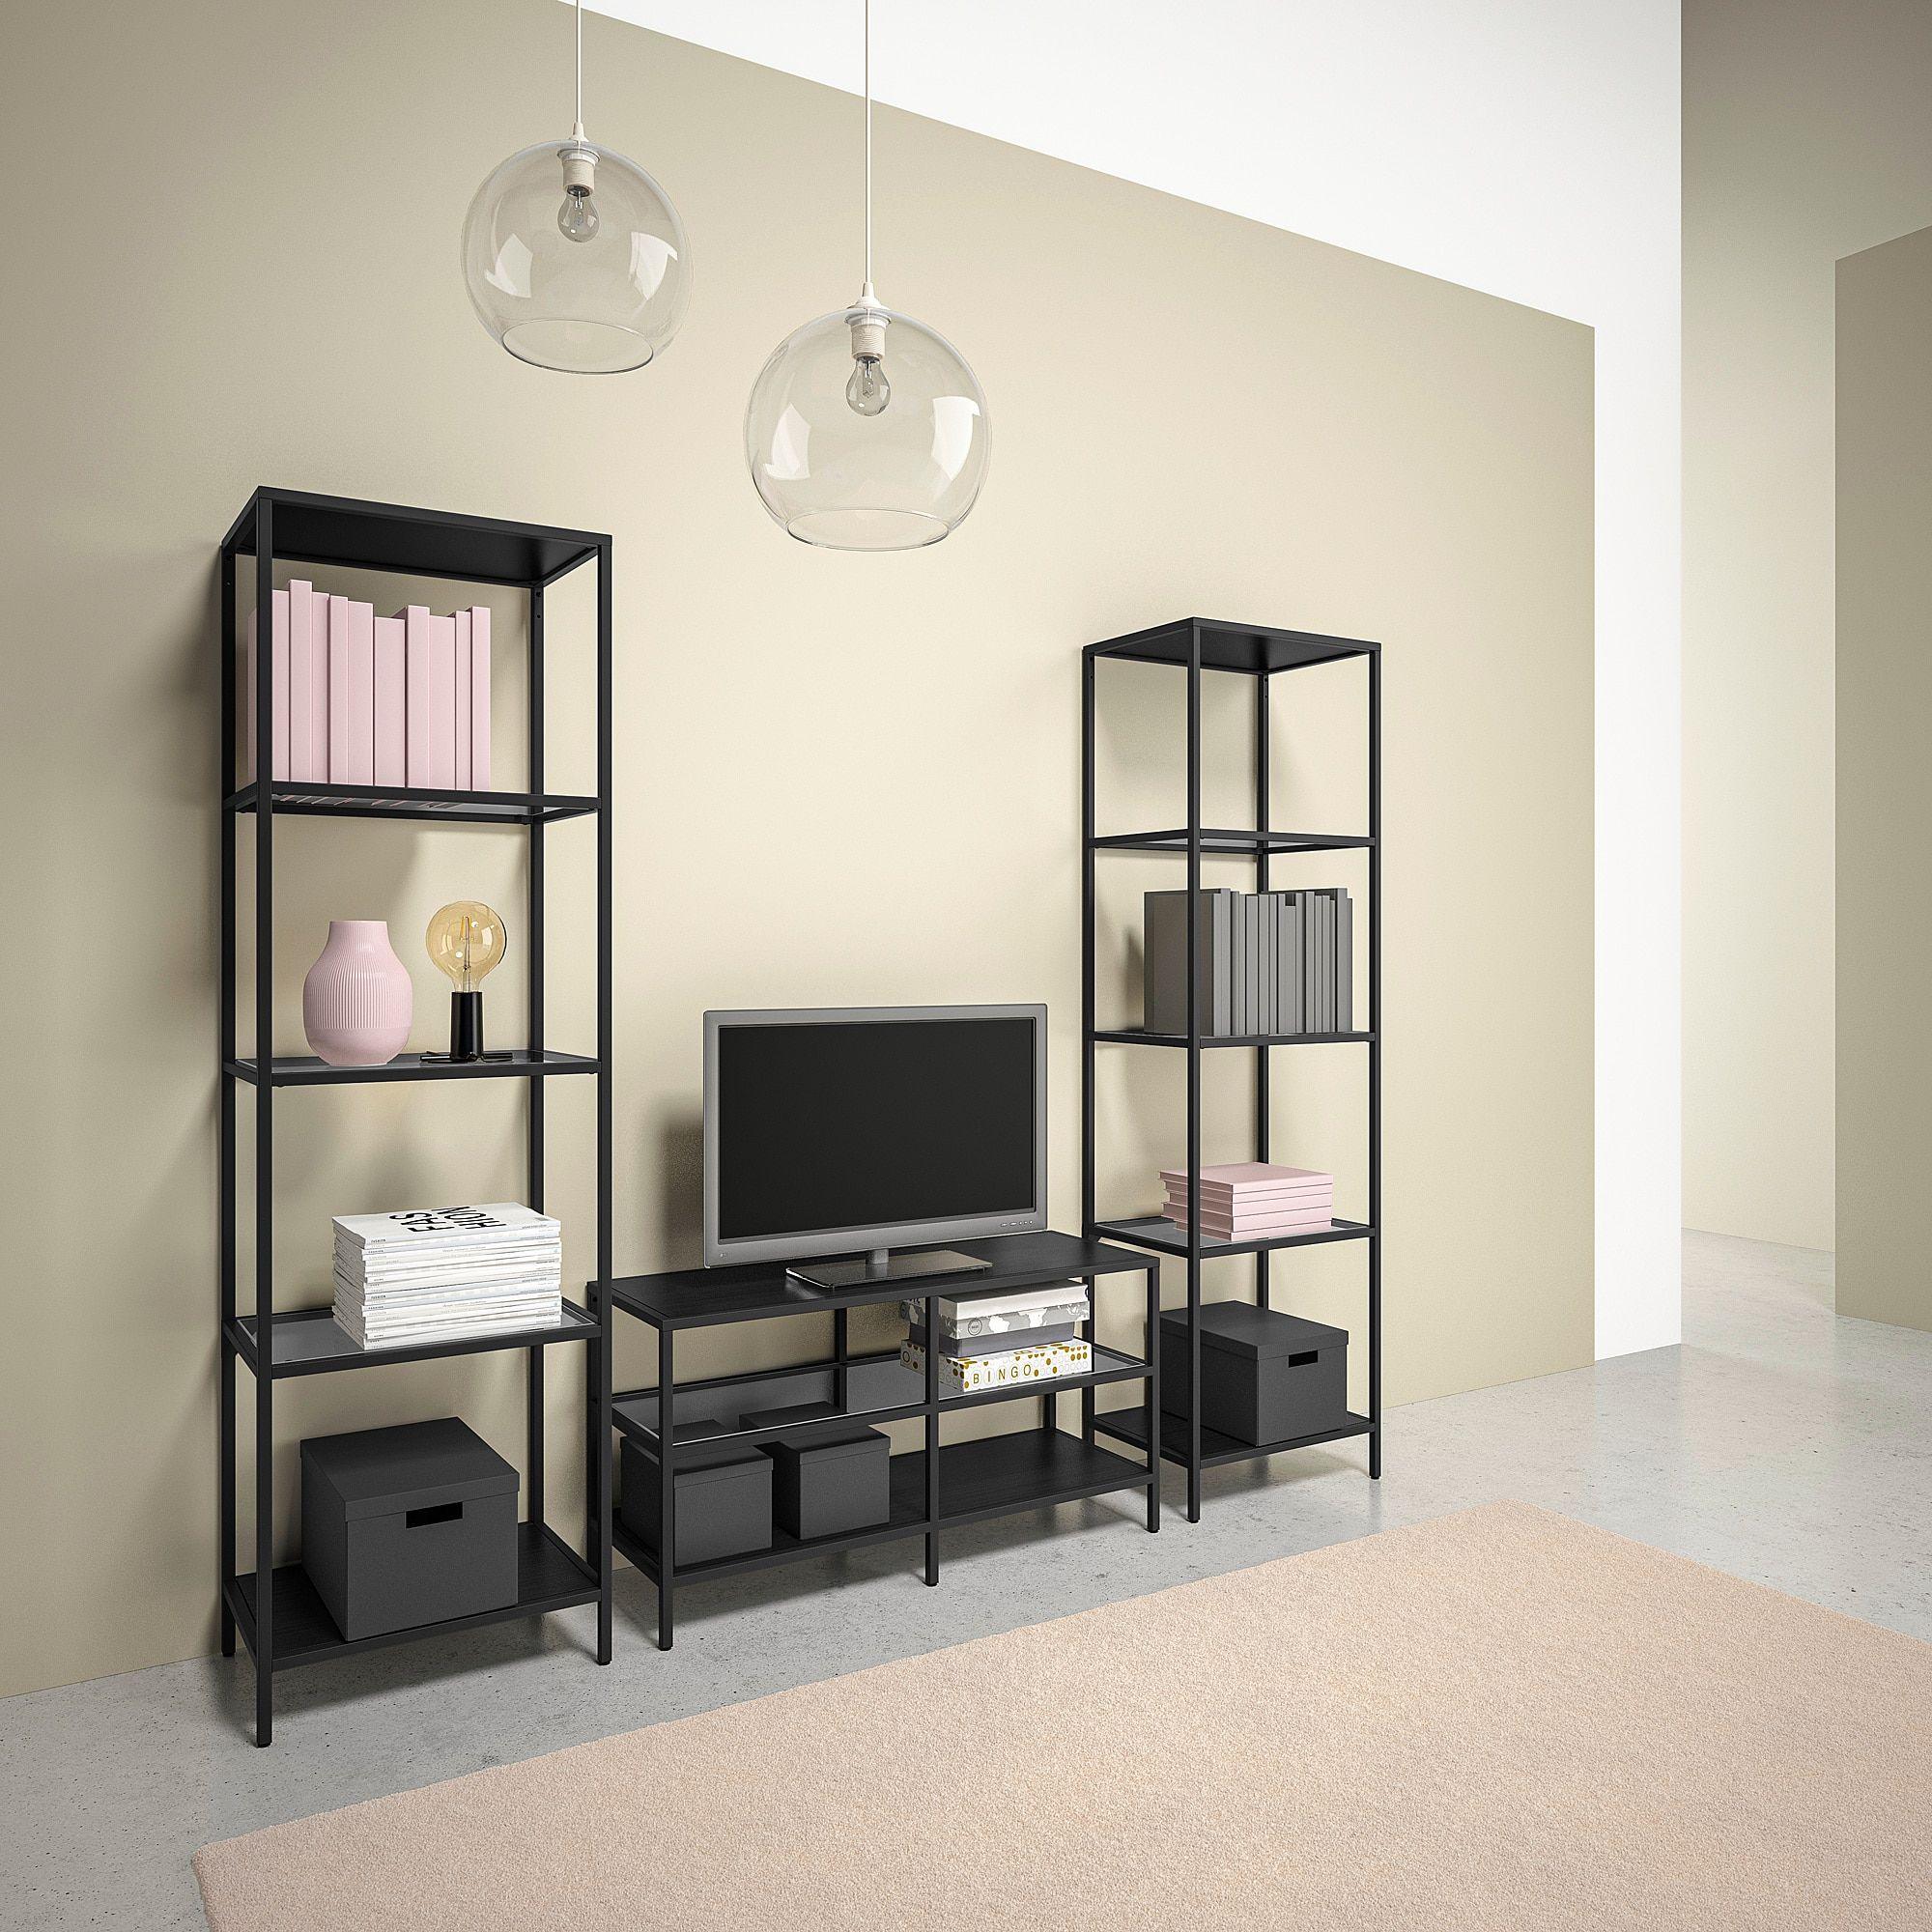 Vittsjo Tv Storage Combination Black Brown Glass 202x36x175 Cm Ikea Meuble Tv Rangement Ikea Meuble